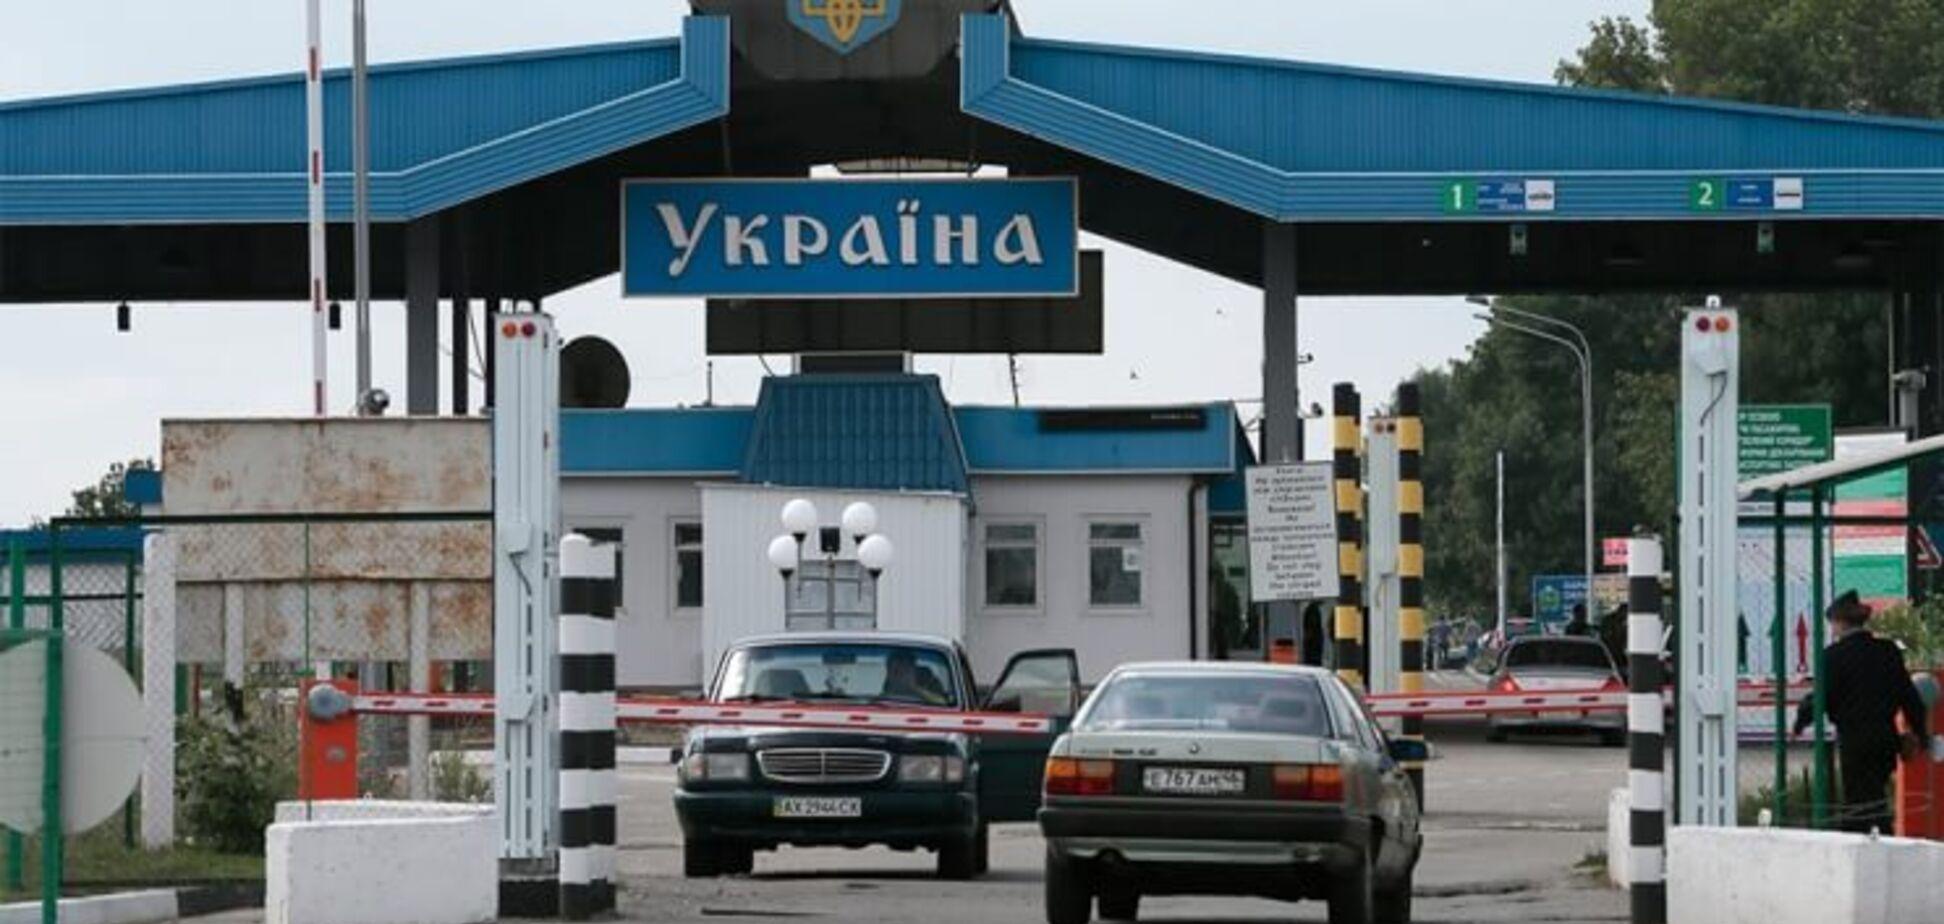 Керівництво українських митниць масово звільнили